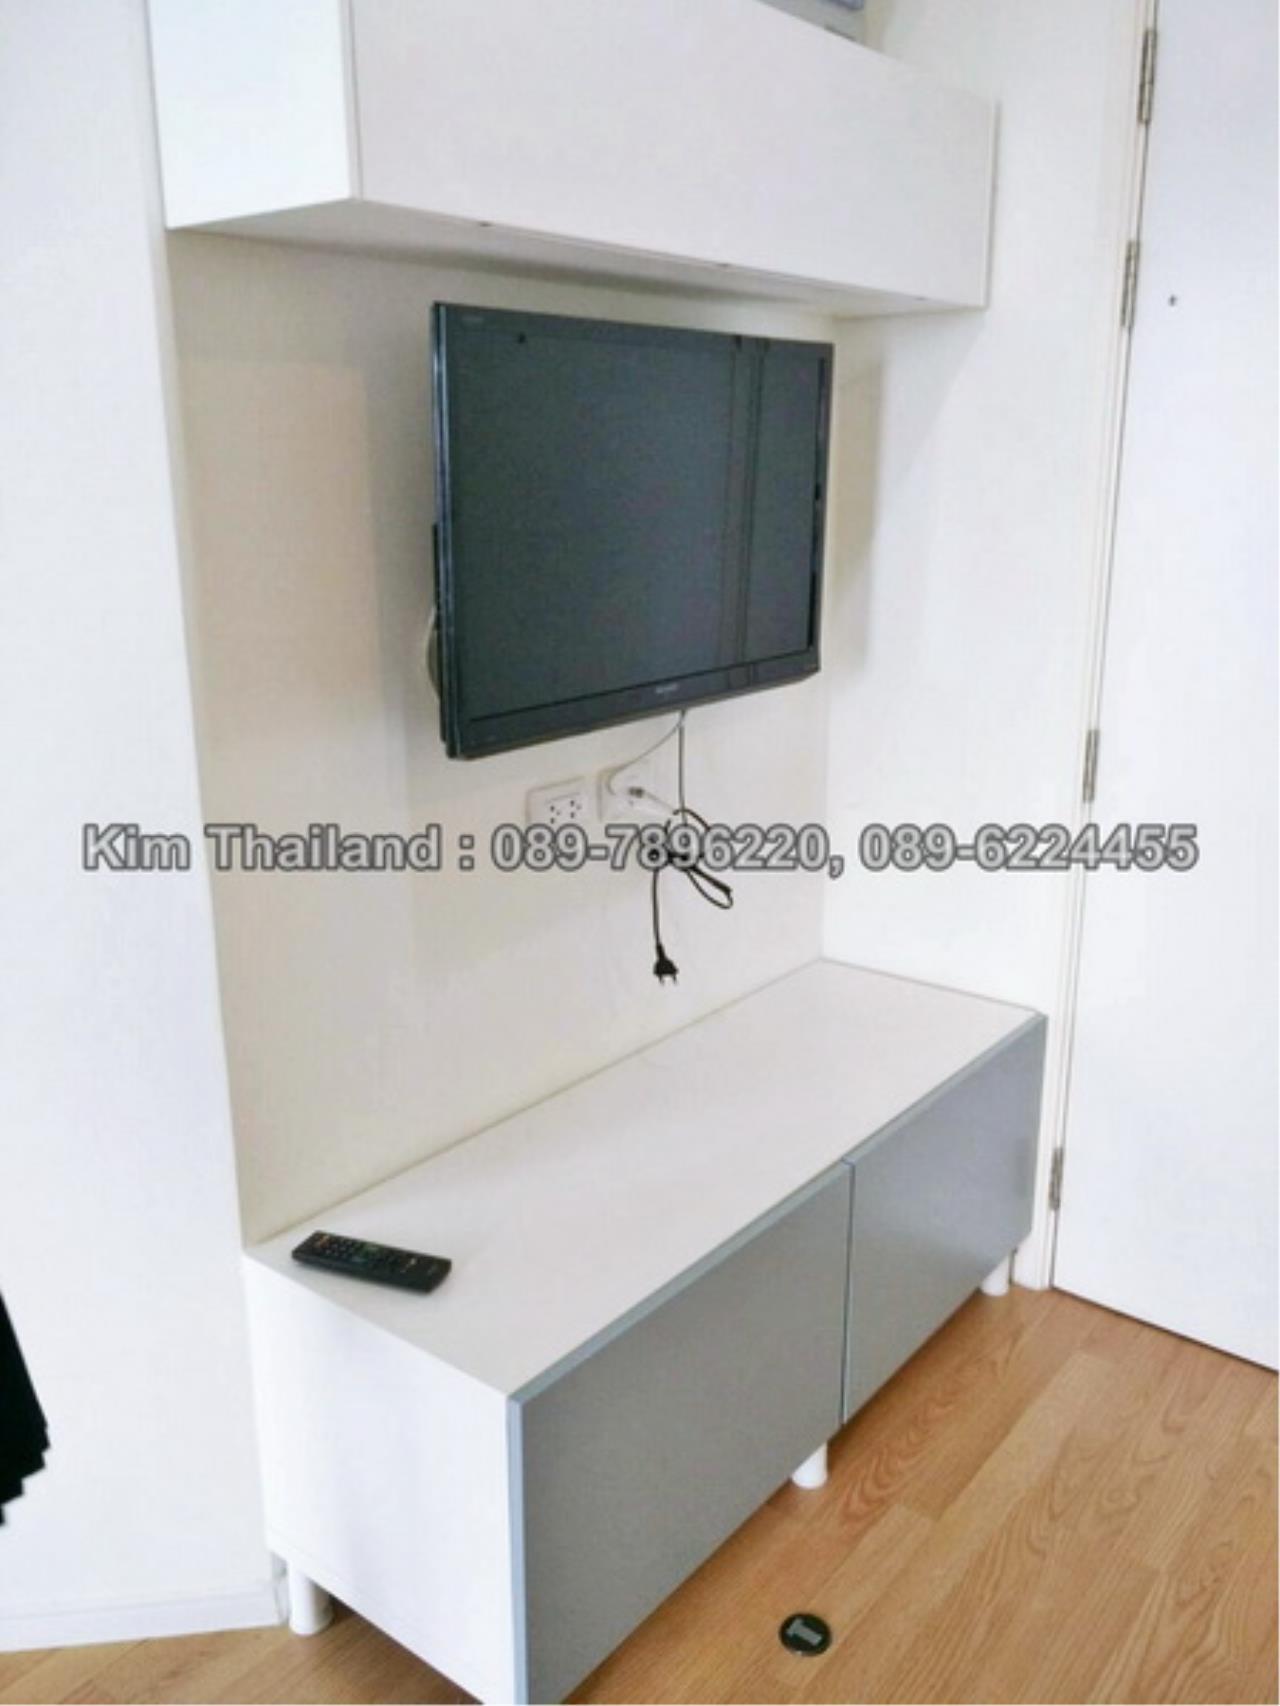 BKKcondorental Agency's For rent,Condo Lumpini Ville Prachachuen-Phongphet 2. Building B,  Area 26 sq.m.  2